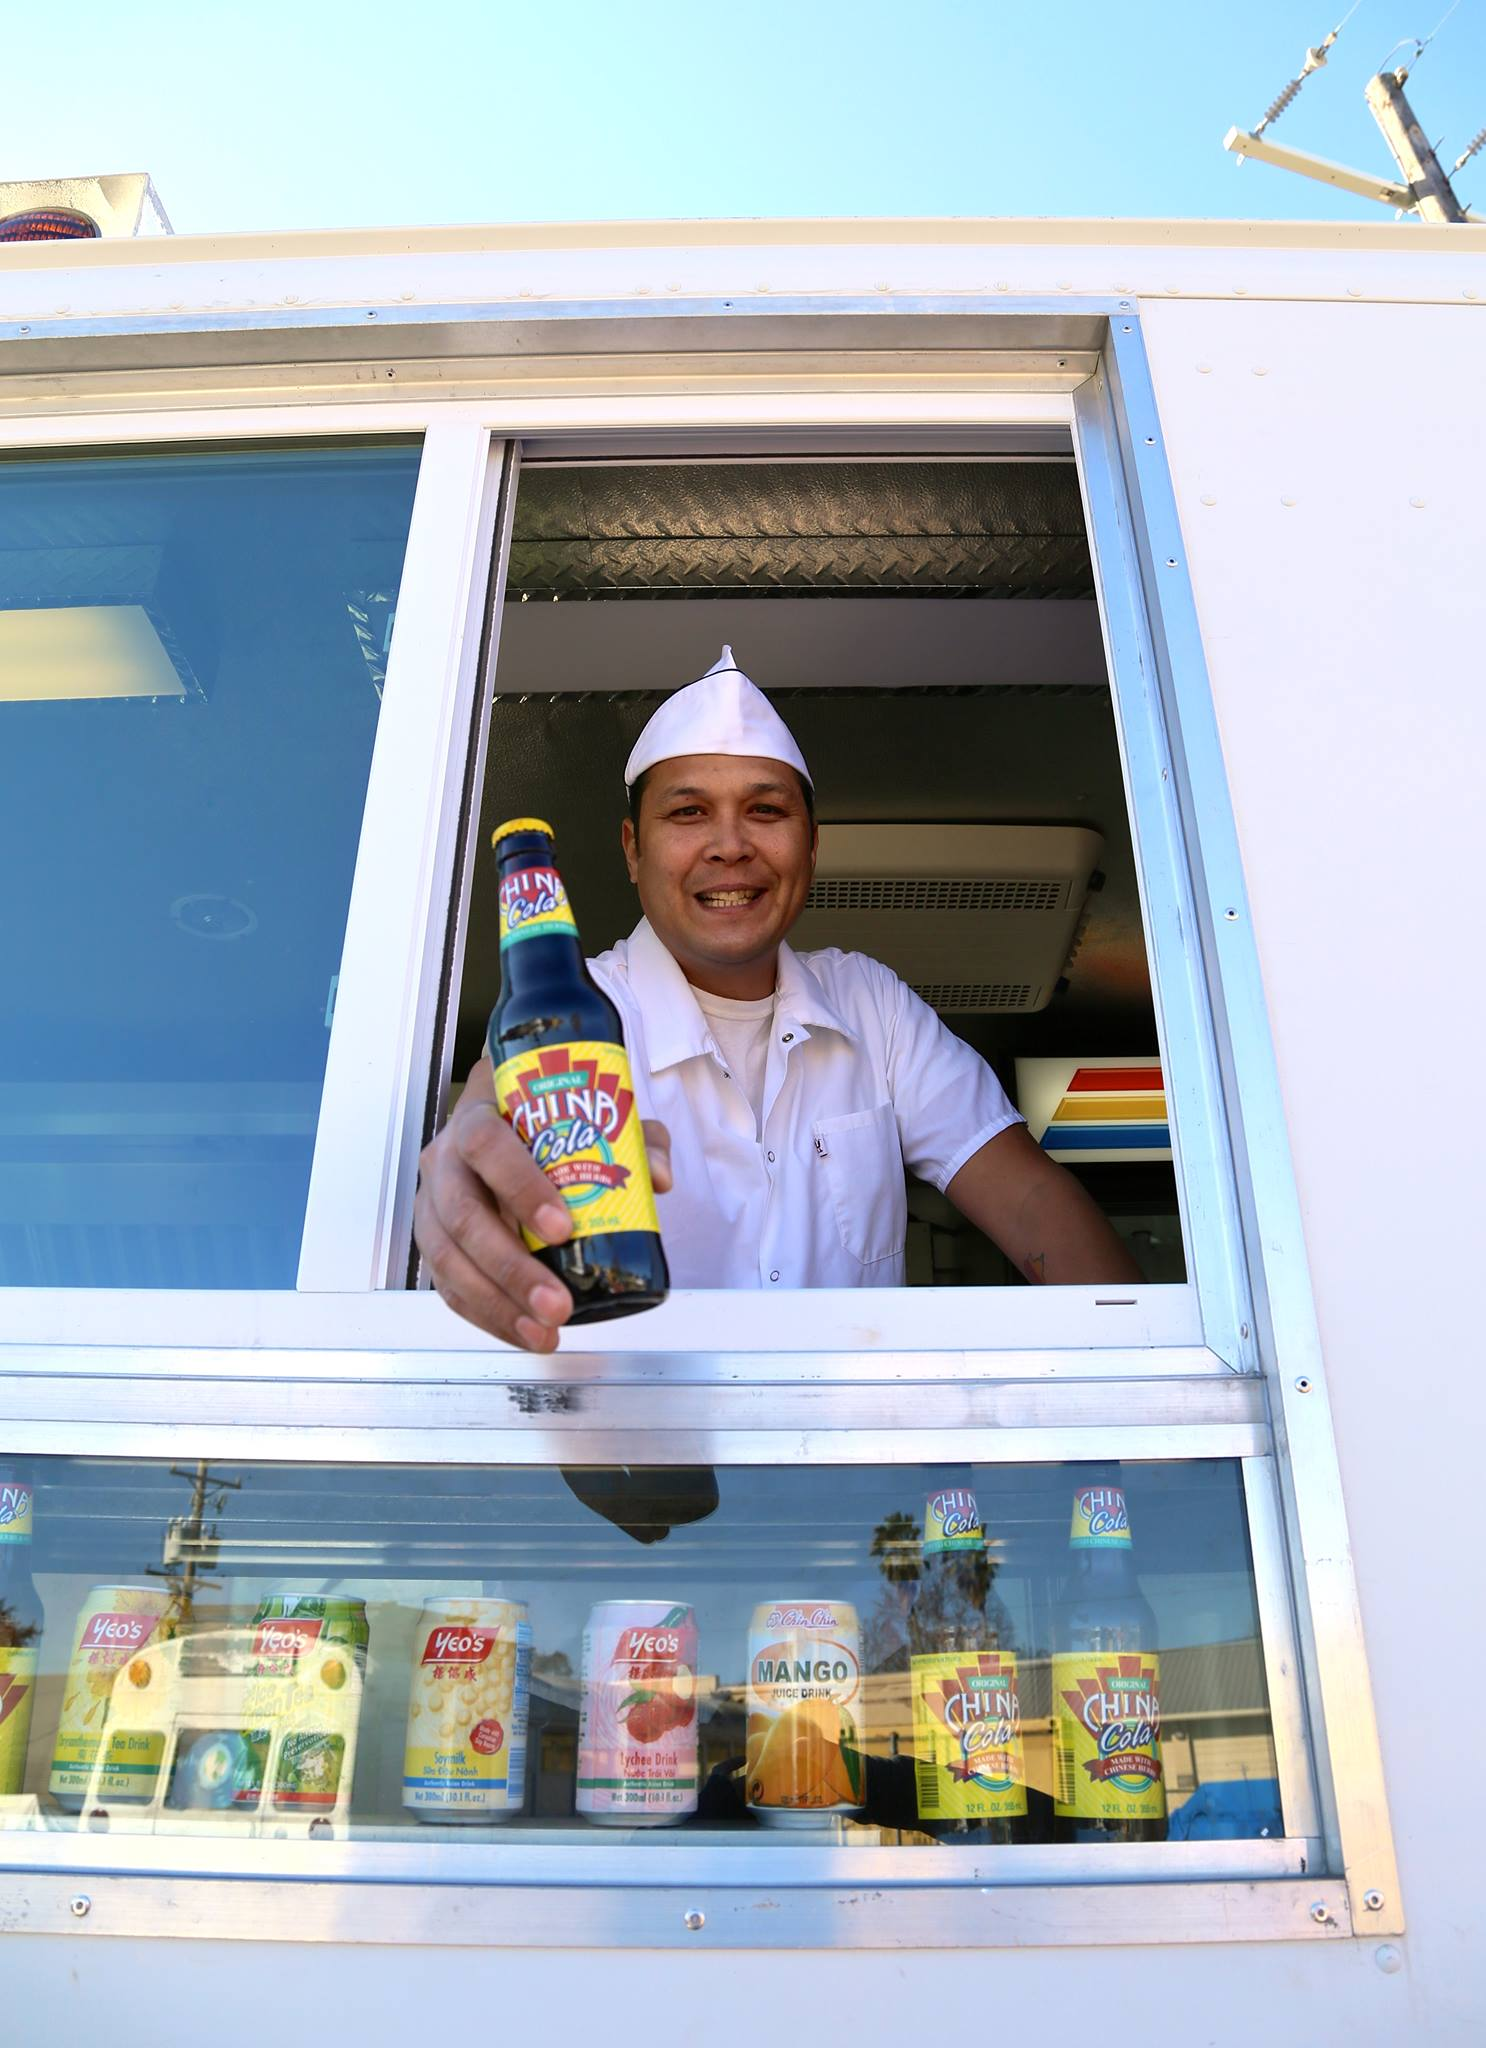 The Food Truck Renaissance